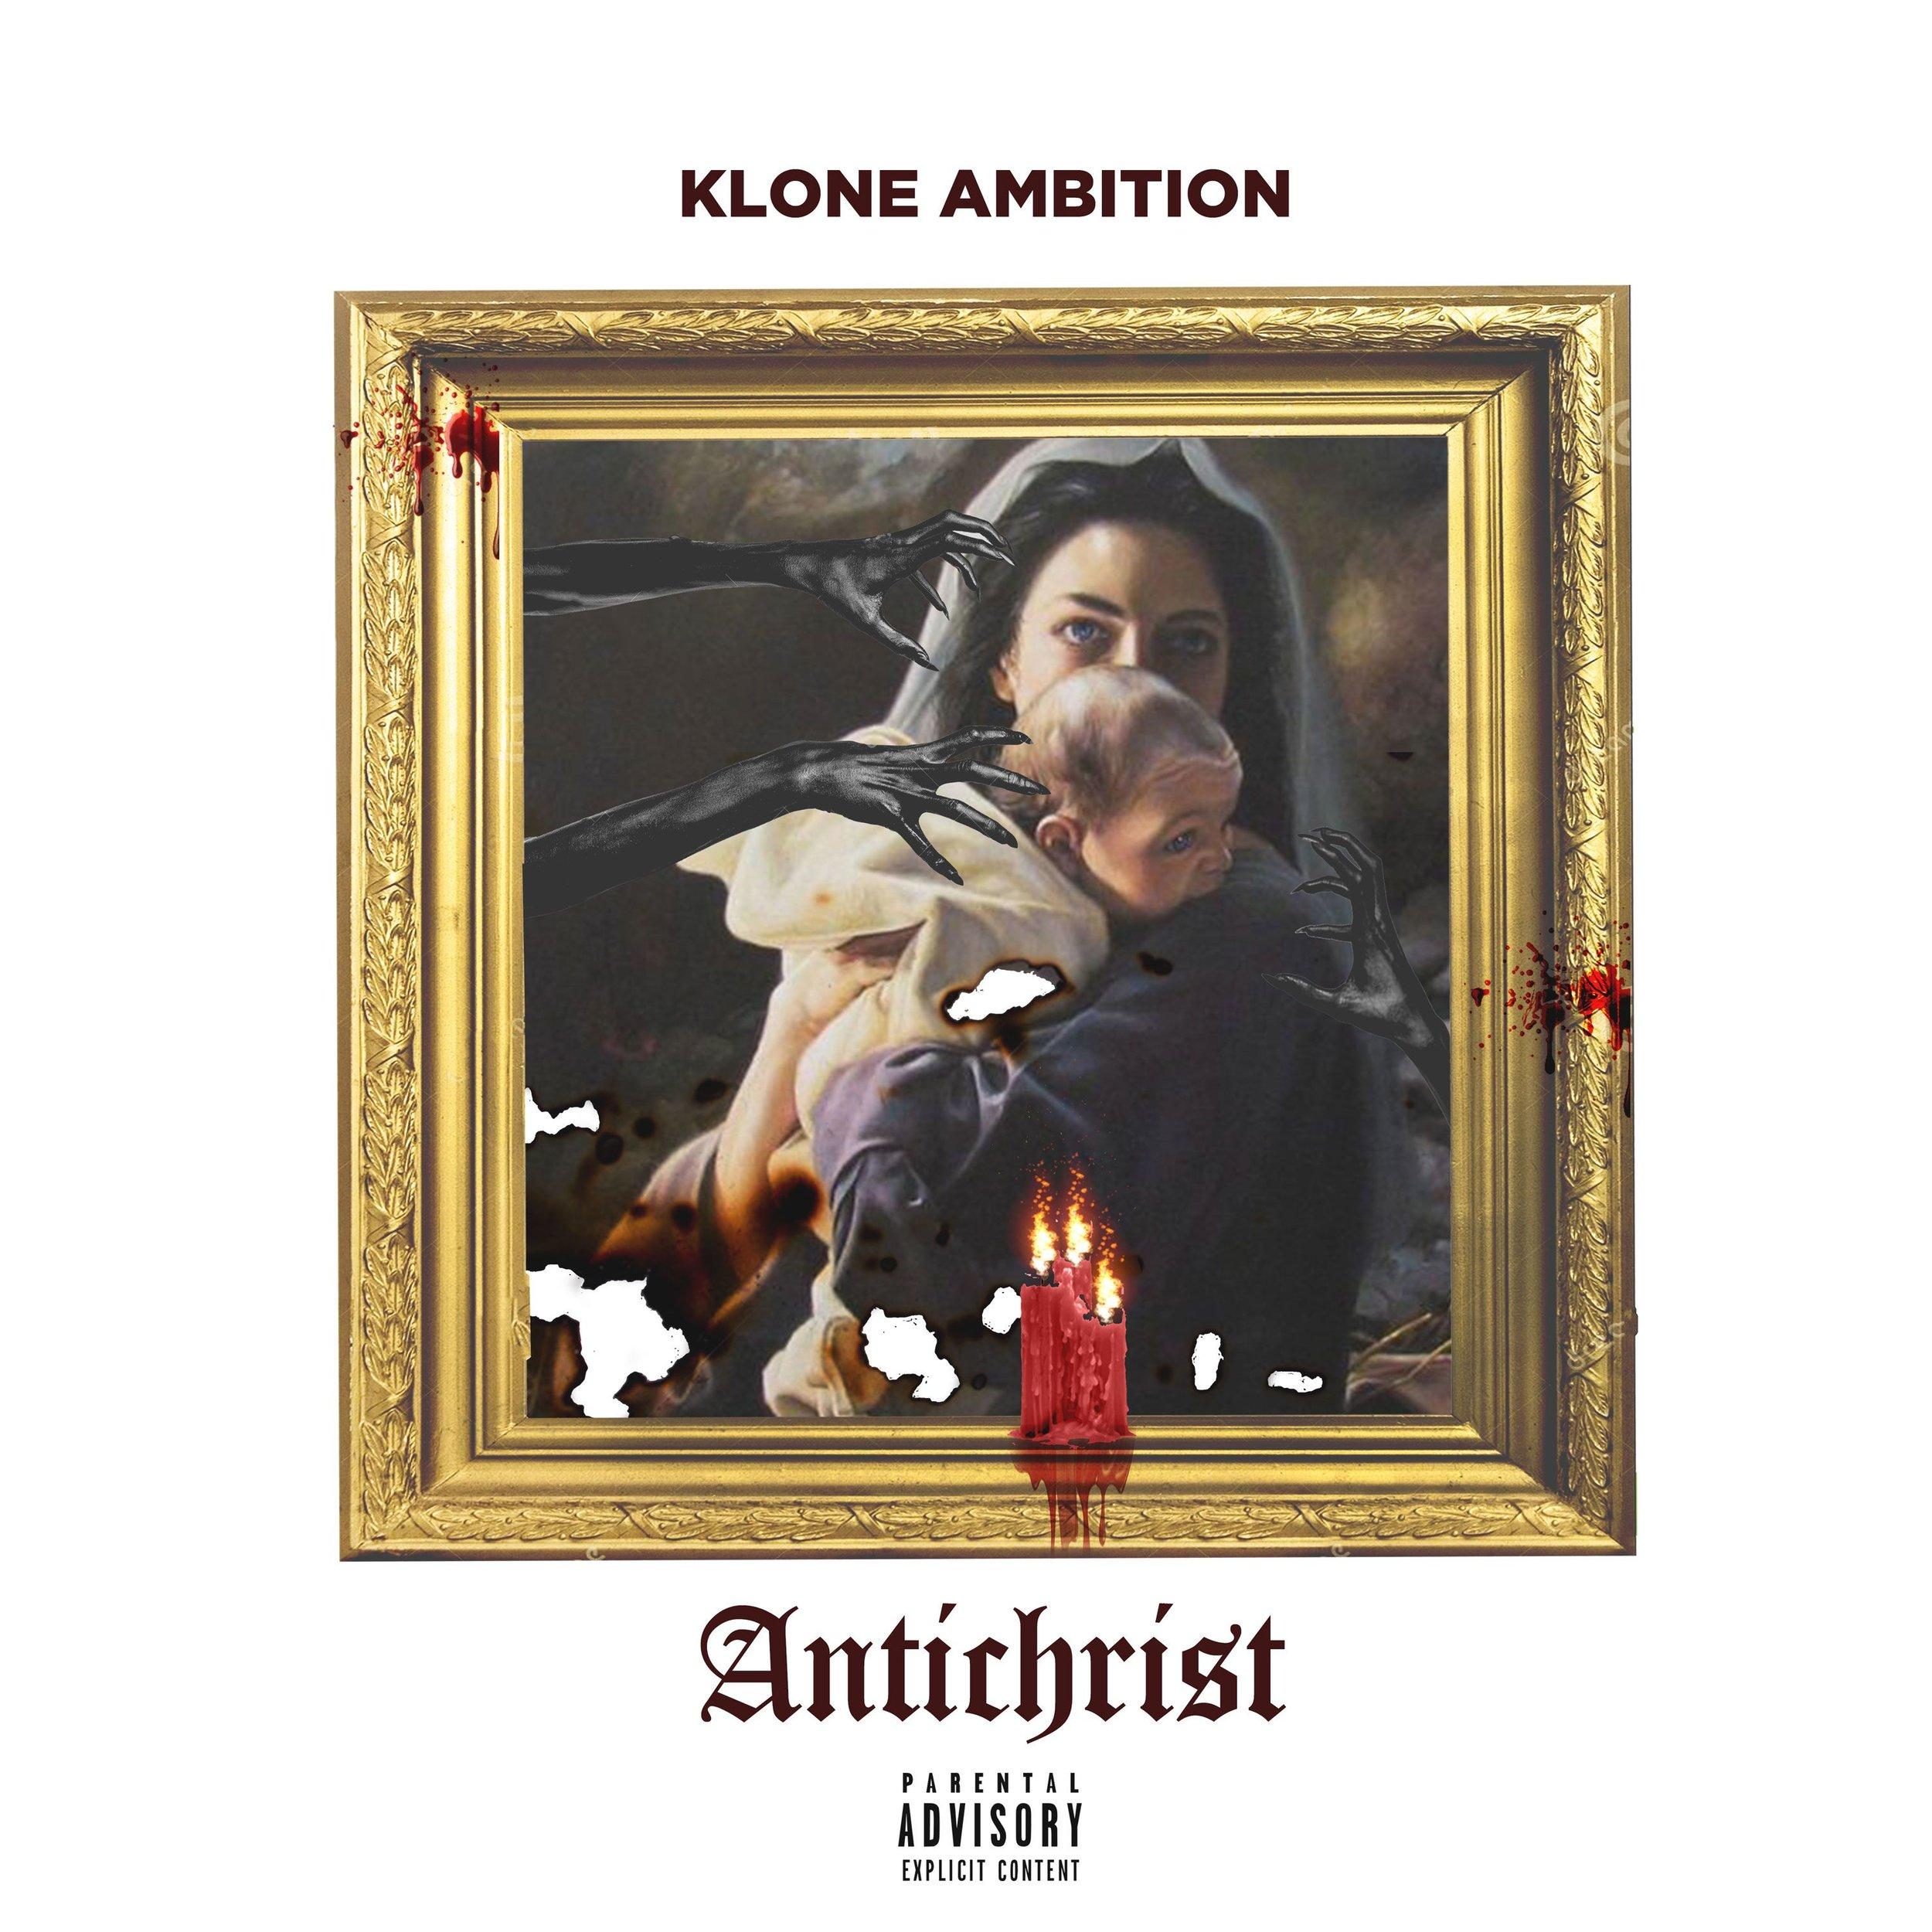 Klone Ambition - ANTICHRIST EP (Cover Art).jpg